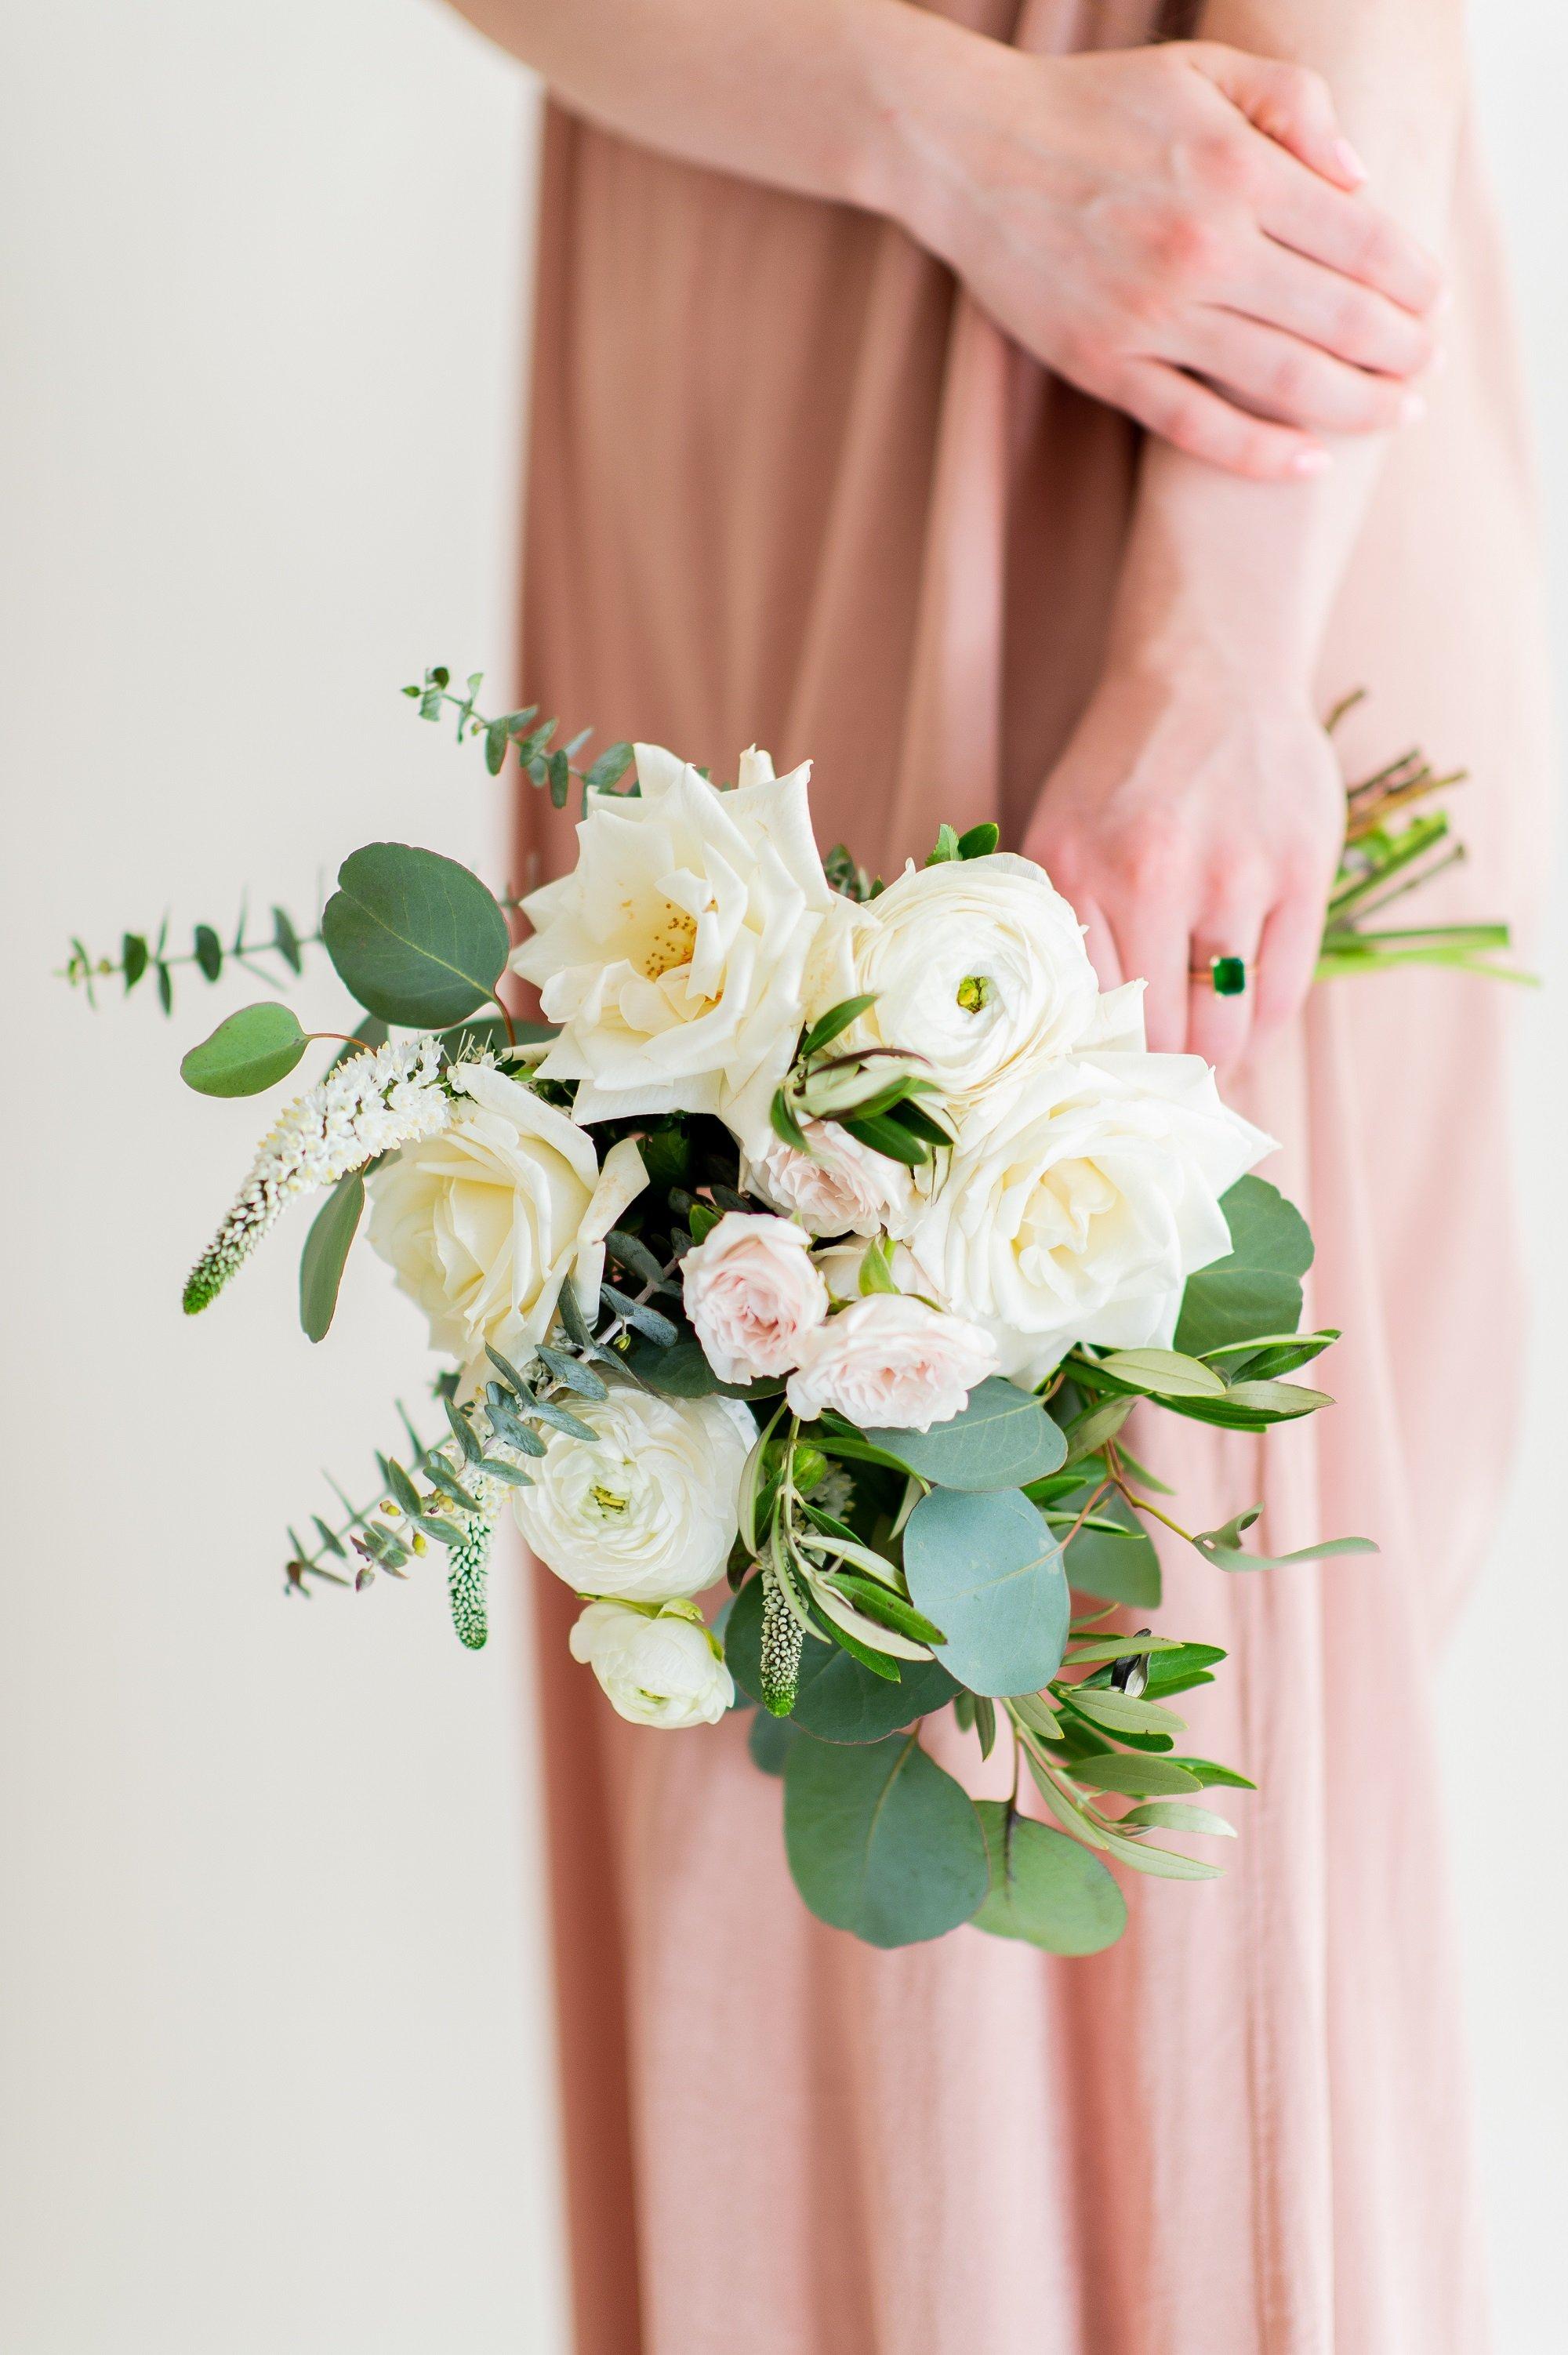 Organic sage bridesmaid bouquet makes 5 6 flower moxie organic sage and green bridesmaid bouquet flower moxie diy bridesmaid bouquet izmirmasajfo